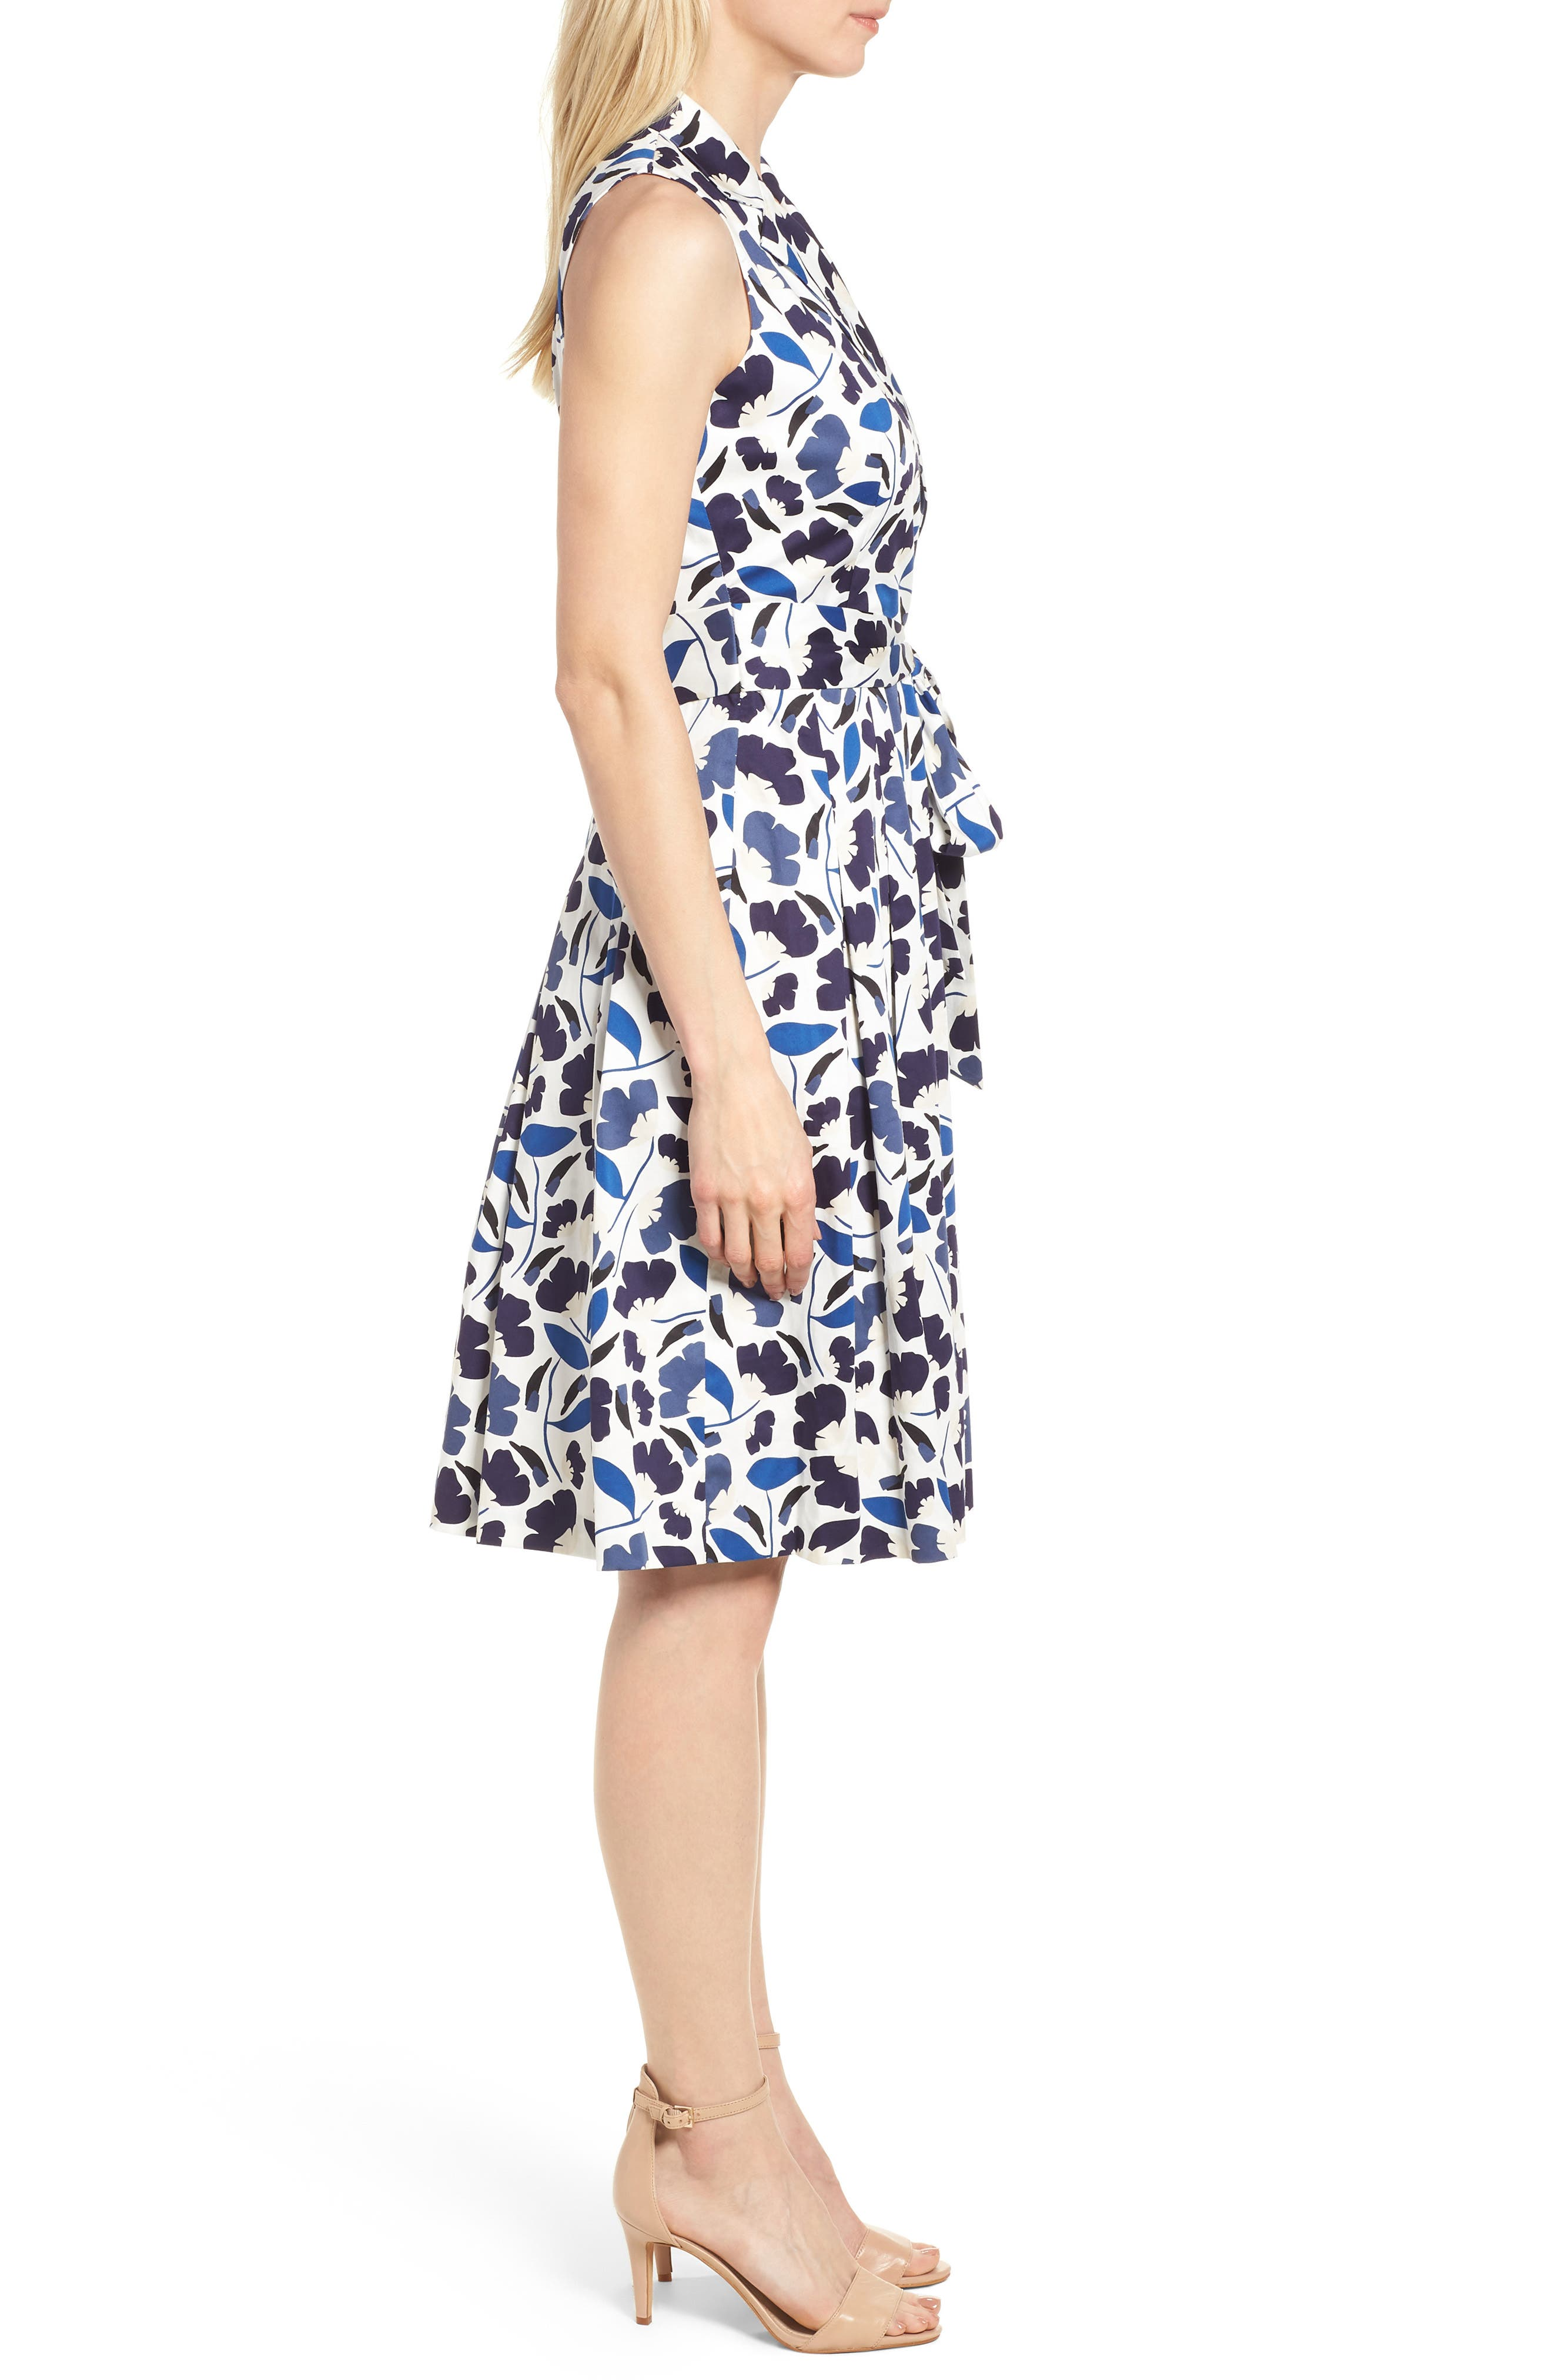 New York Humboldt Cotton Sateen Dress,                             Alternate thumbnail 3, color,                             Monaco Combo